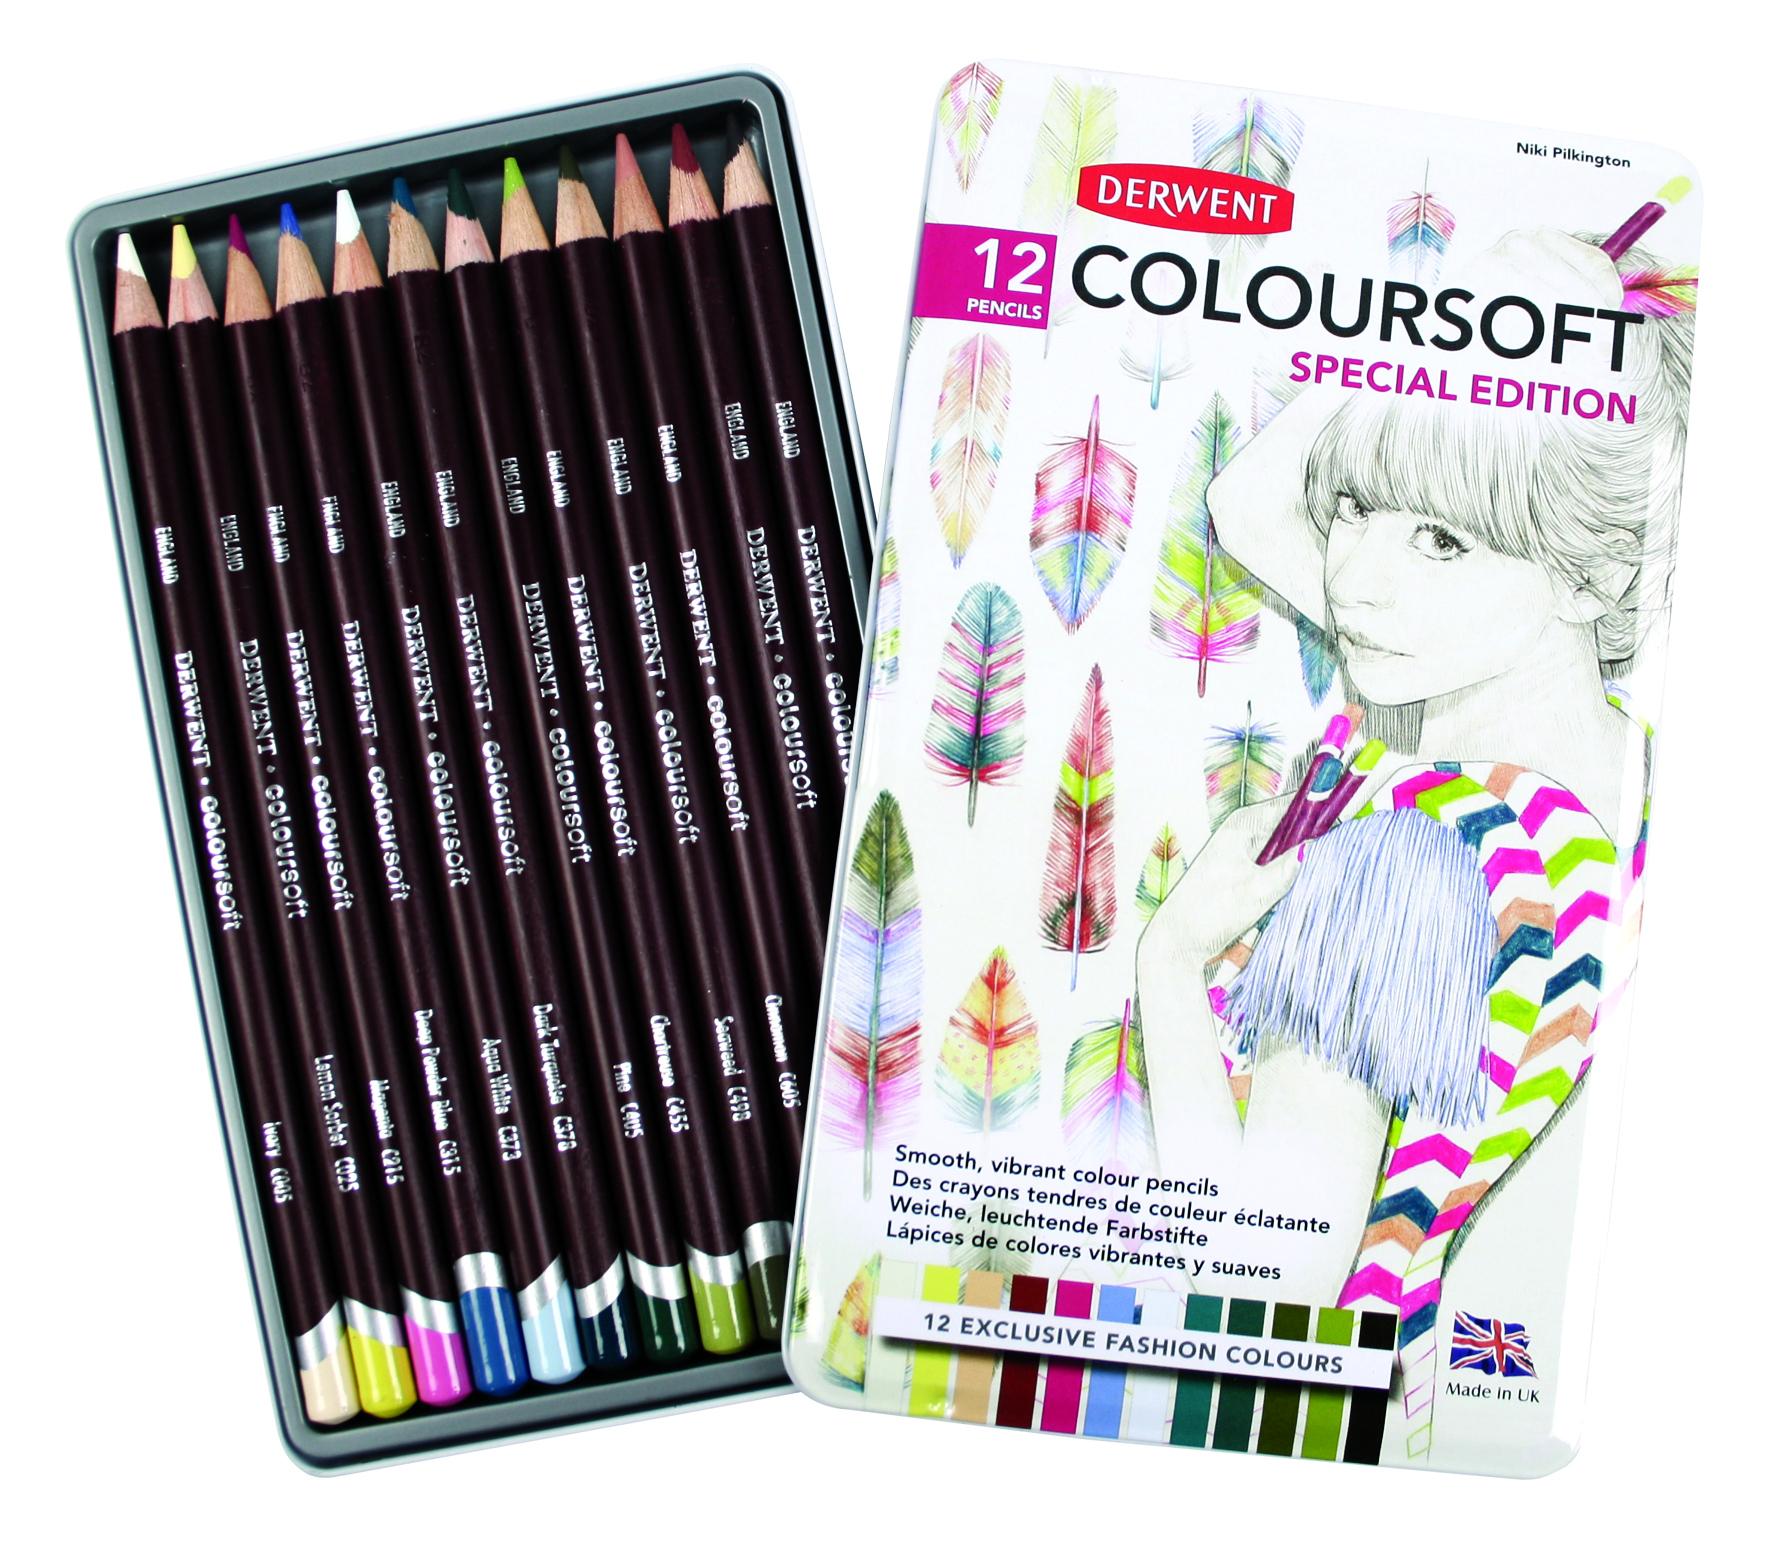 DERWENT PENCILS / Limited edition Coloursoft tin